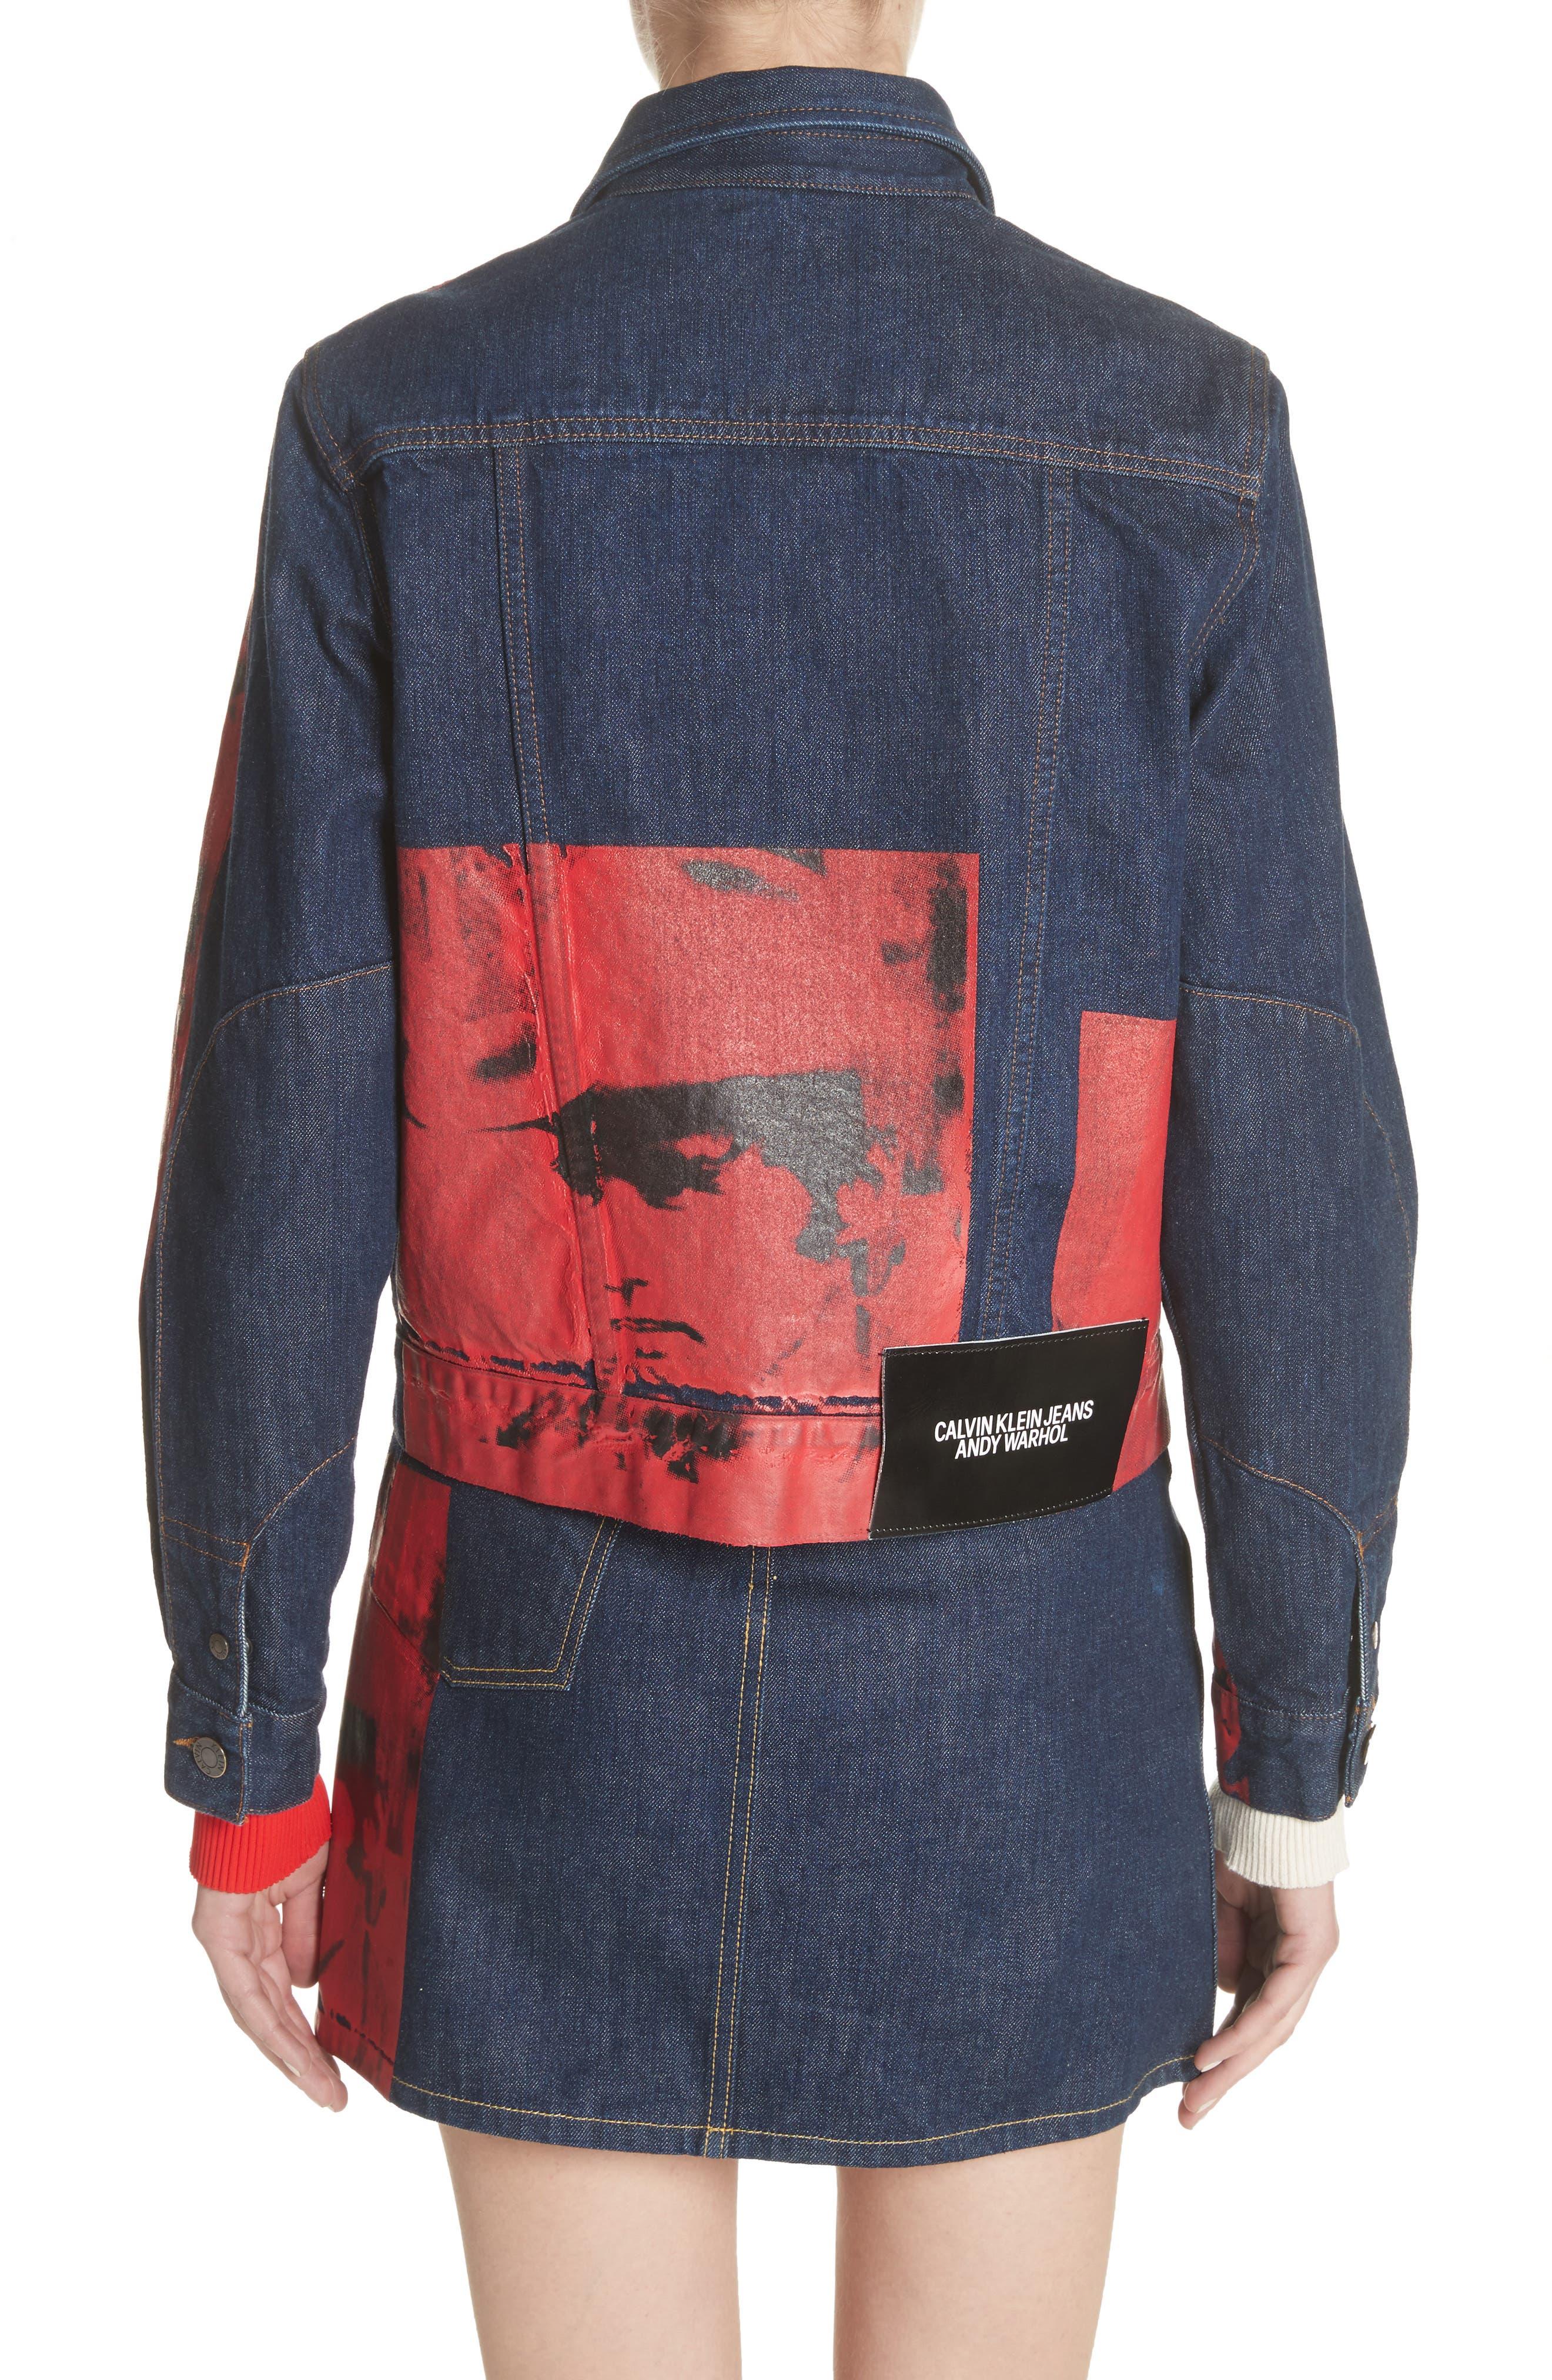 x Andy Warhol Foundation Dennis Hopper Denim Jacket,                             Alternate thumbnail 3, color,                             Blue Molten Lava